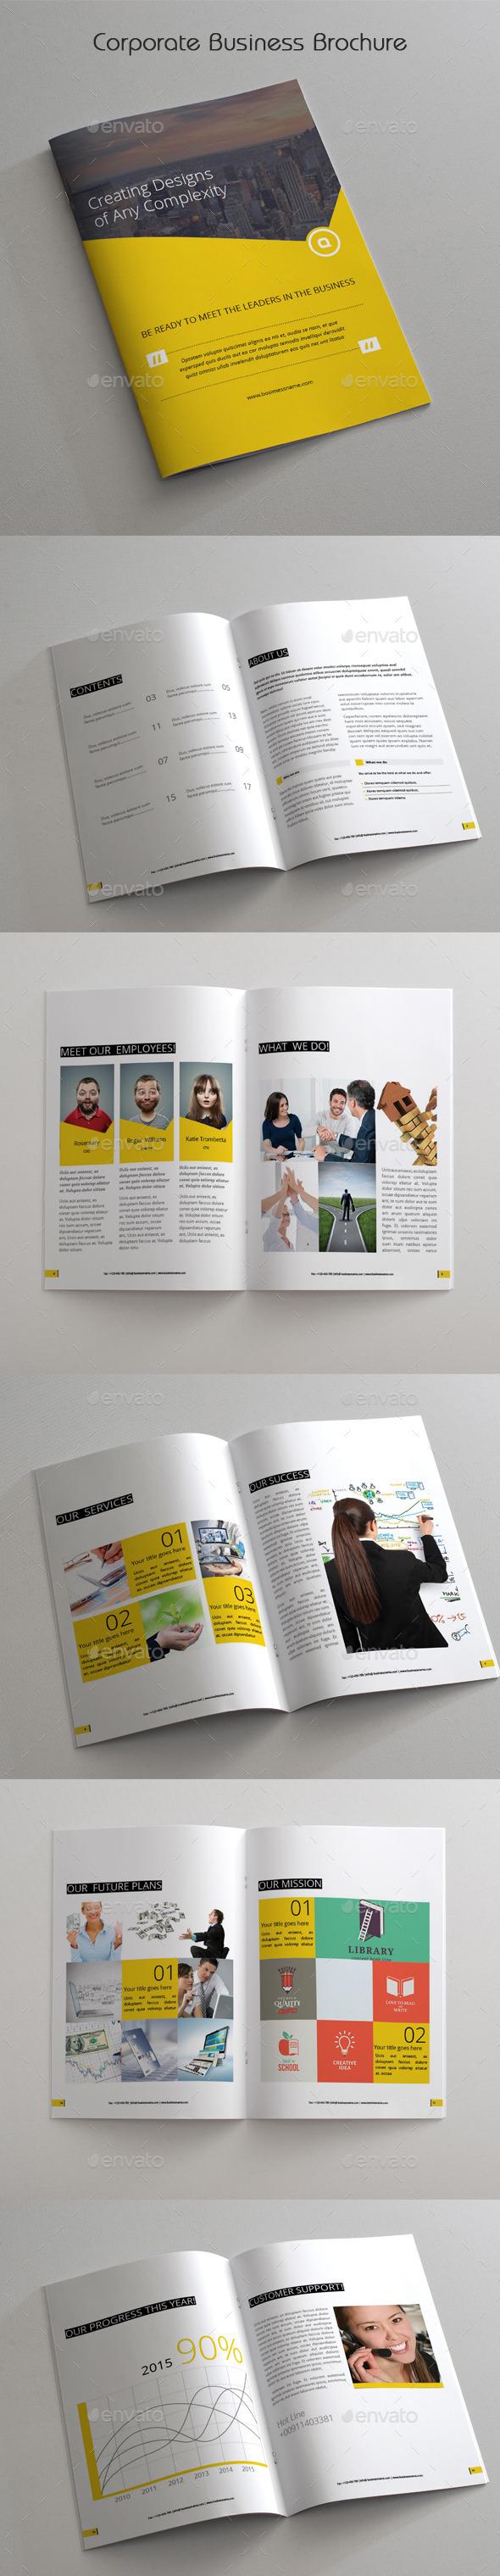 GraphicRiver Corporate Business Brochure 11956611